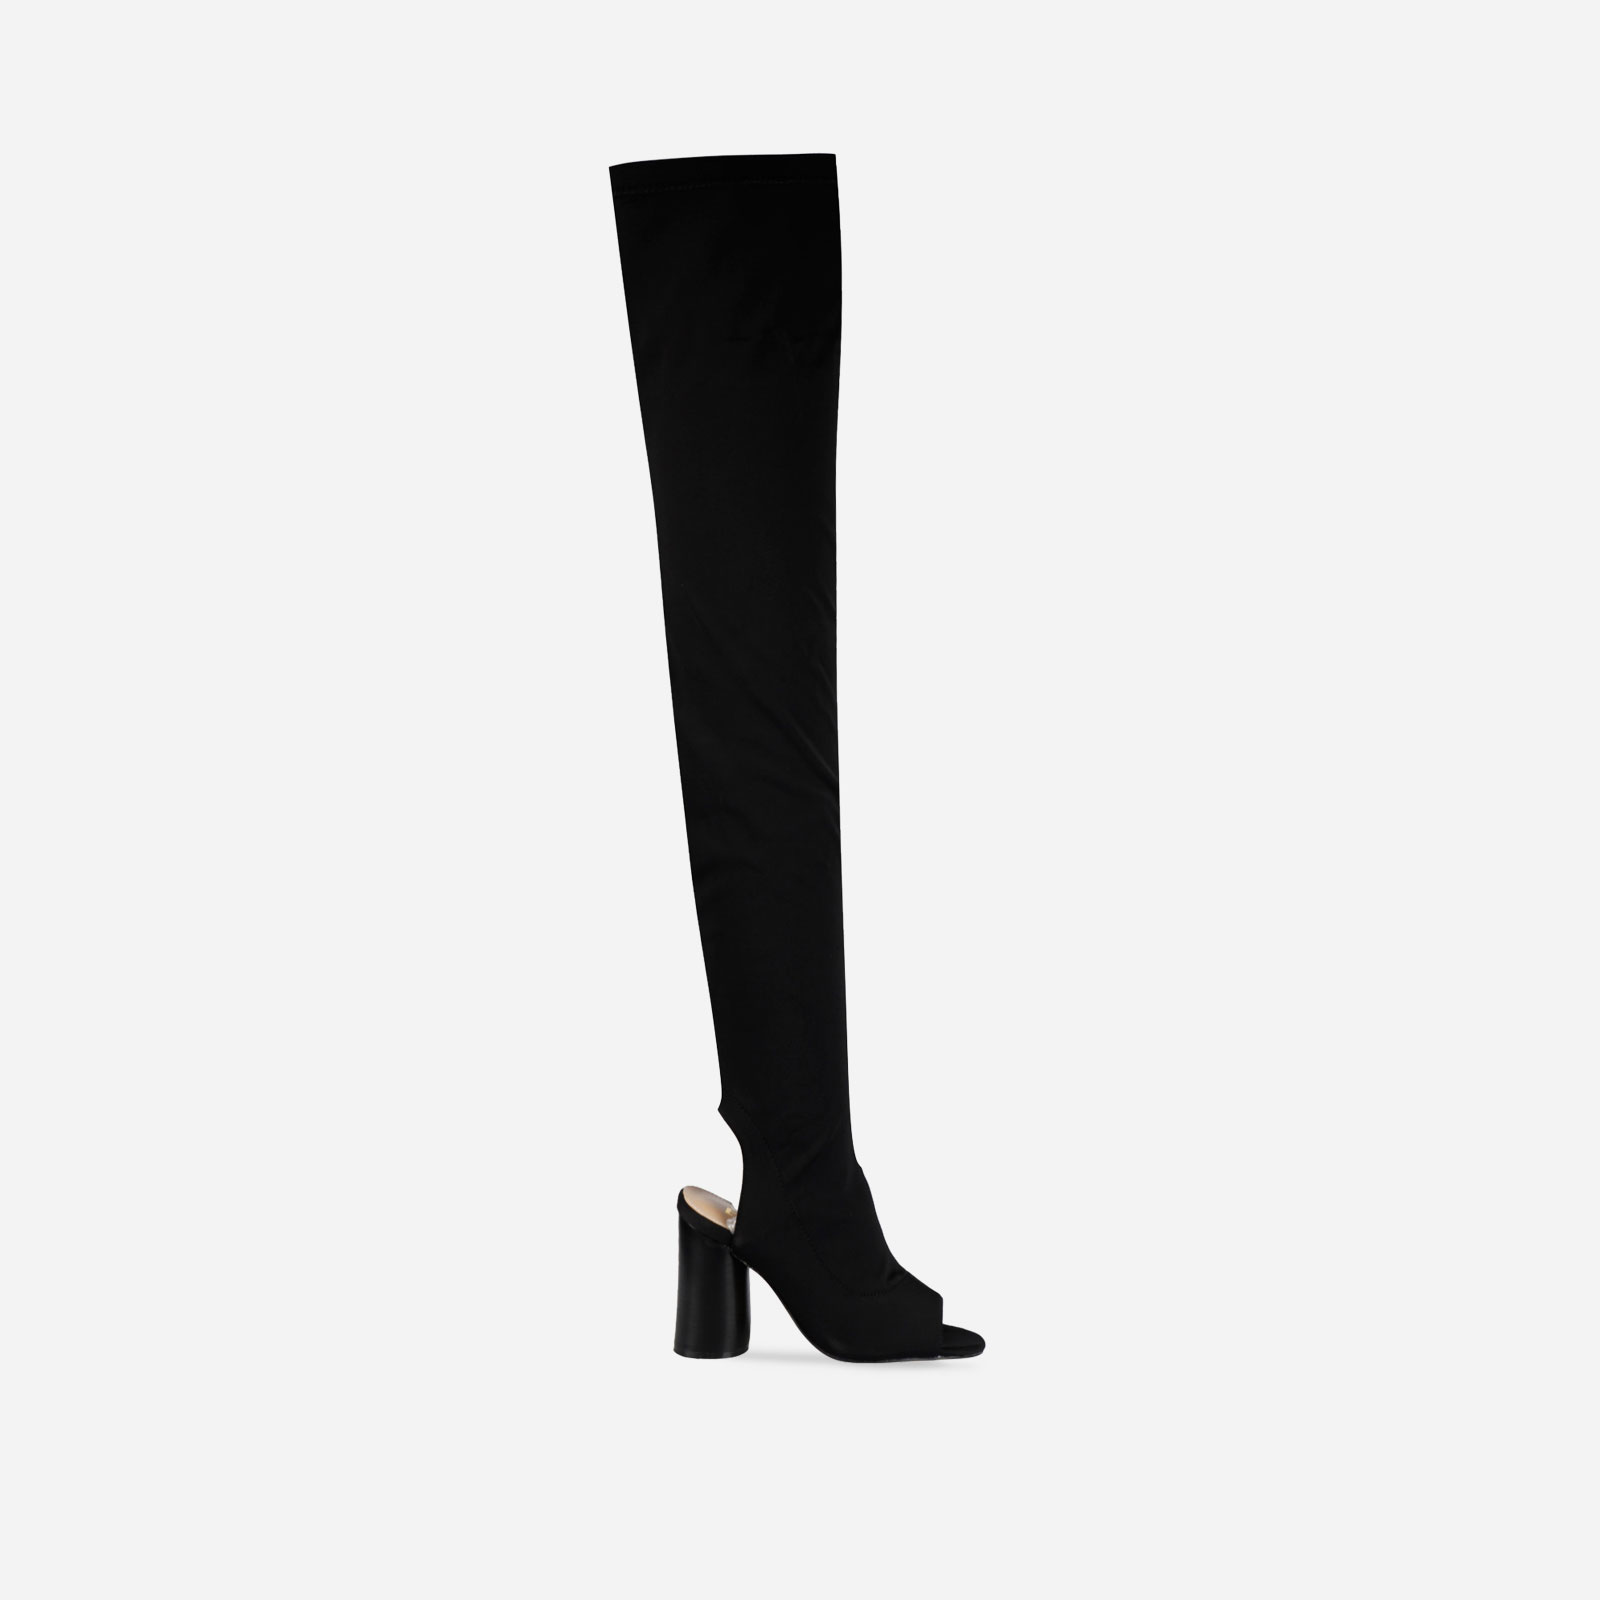 Layla Peep Toe Over the Knee Boot In Khaki Lycra Image 1